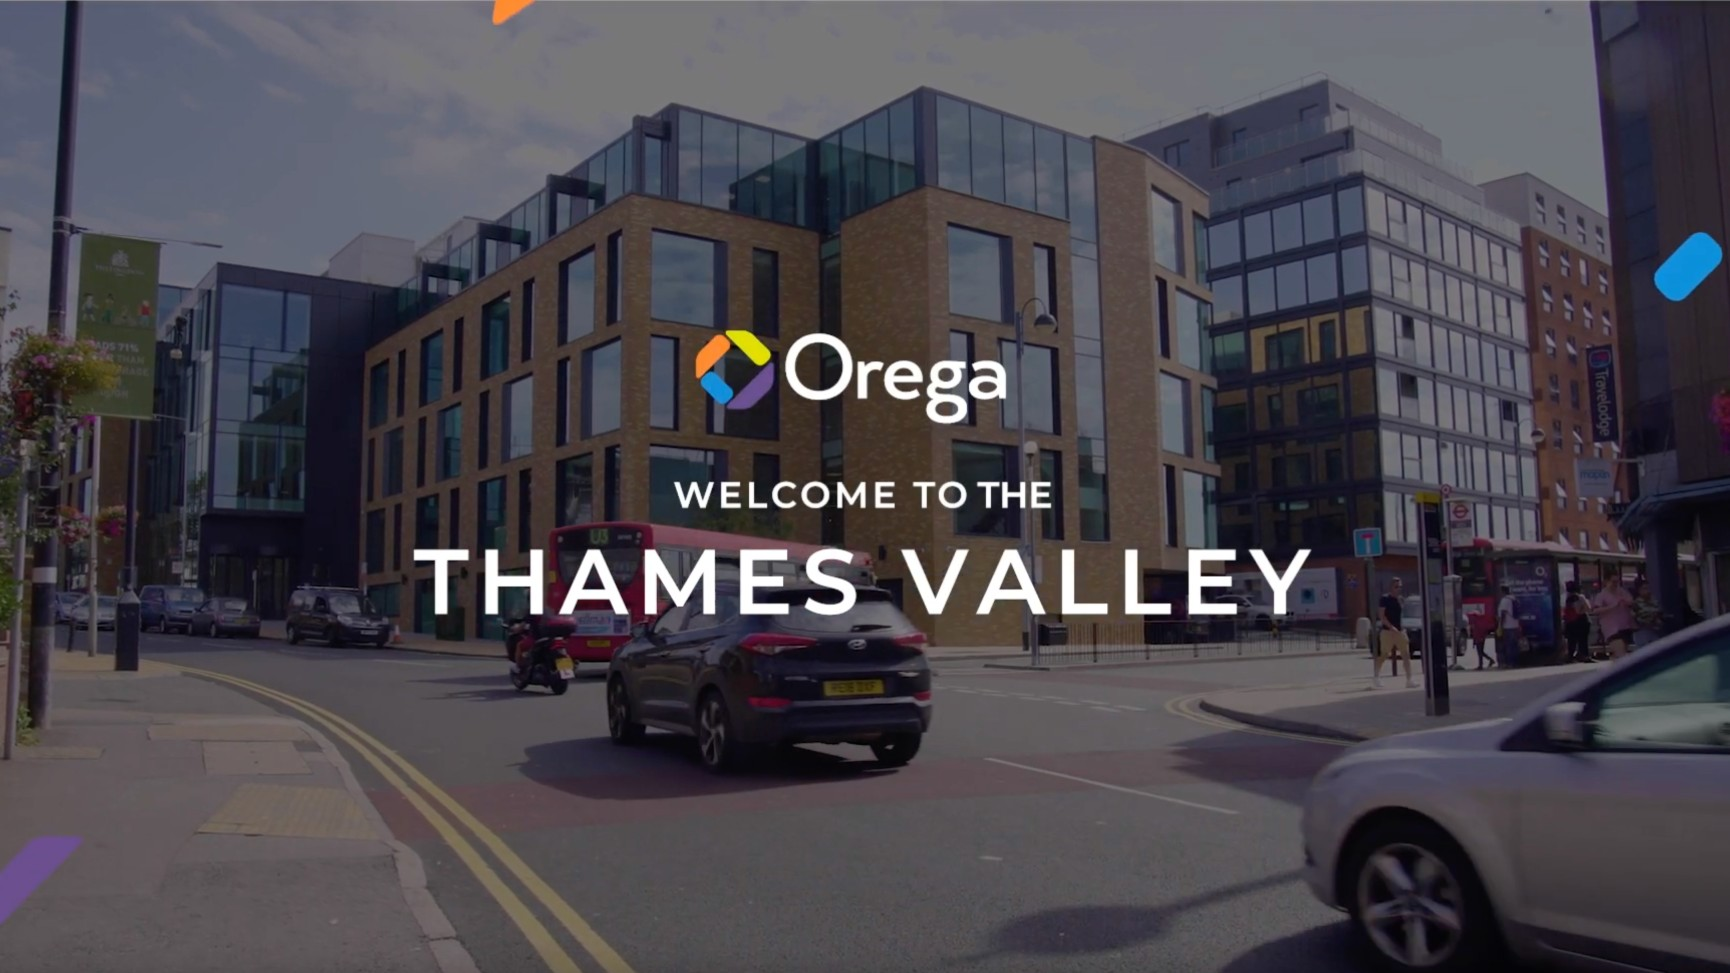 Orega Thames Valley - Resources